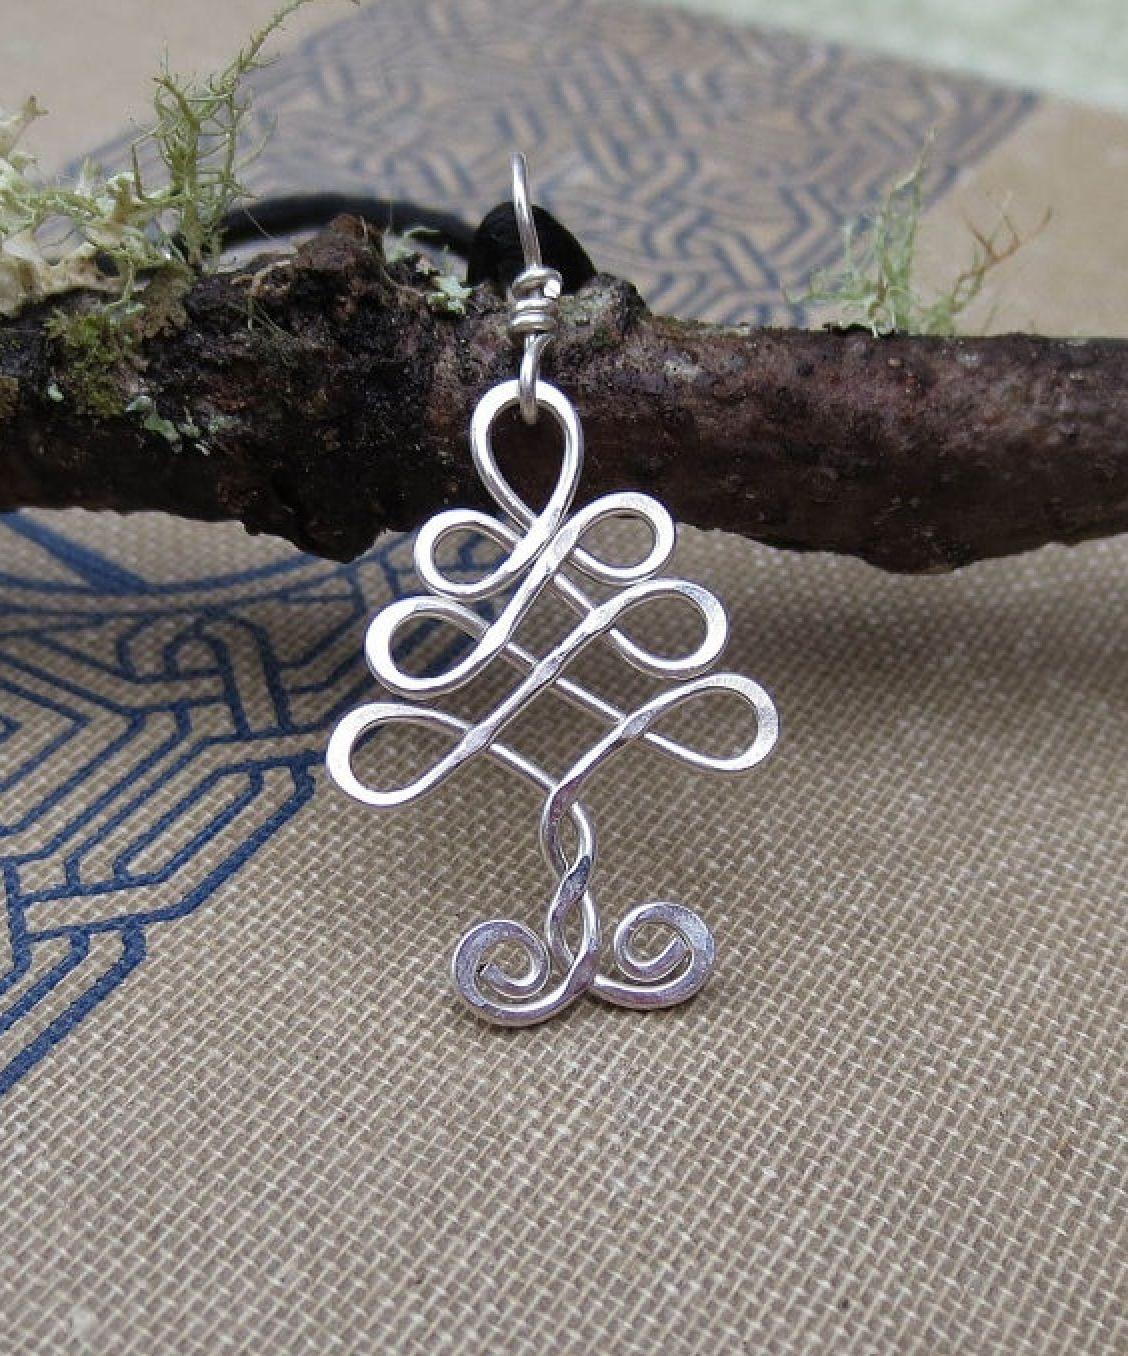 Pin by Татьяна Одерова on украшения | Pinterest | Wire wrapping ...